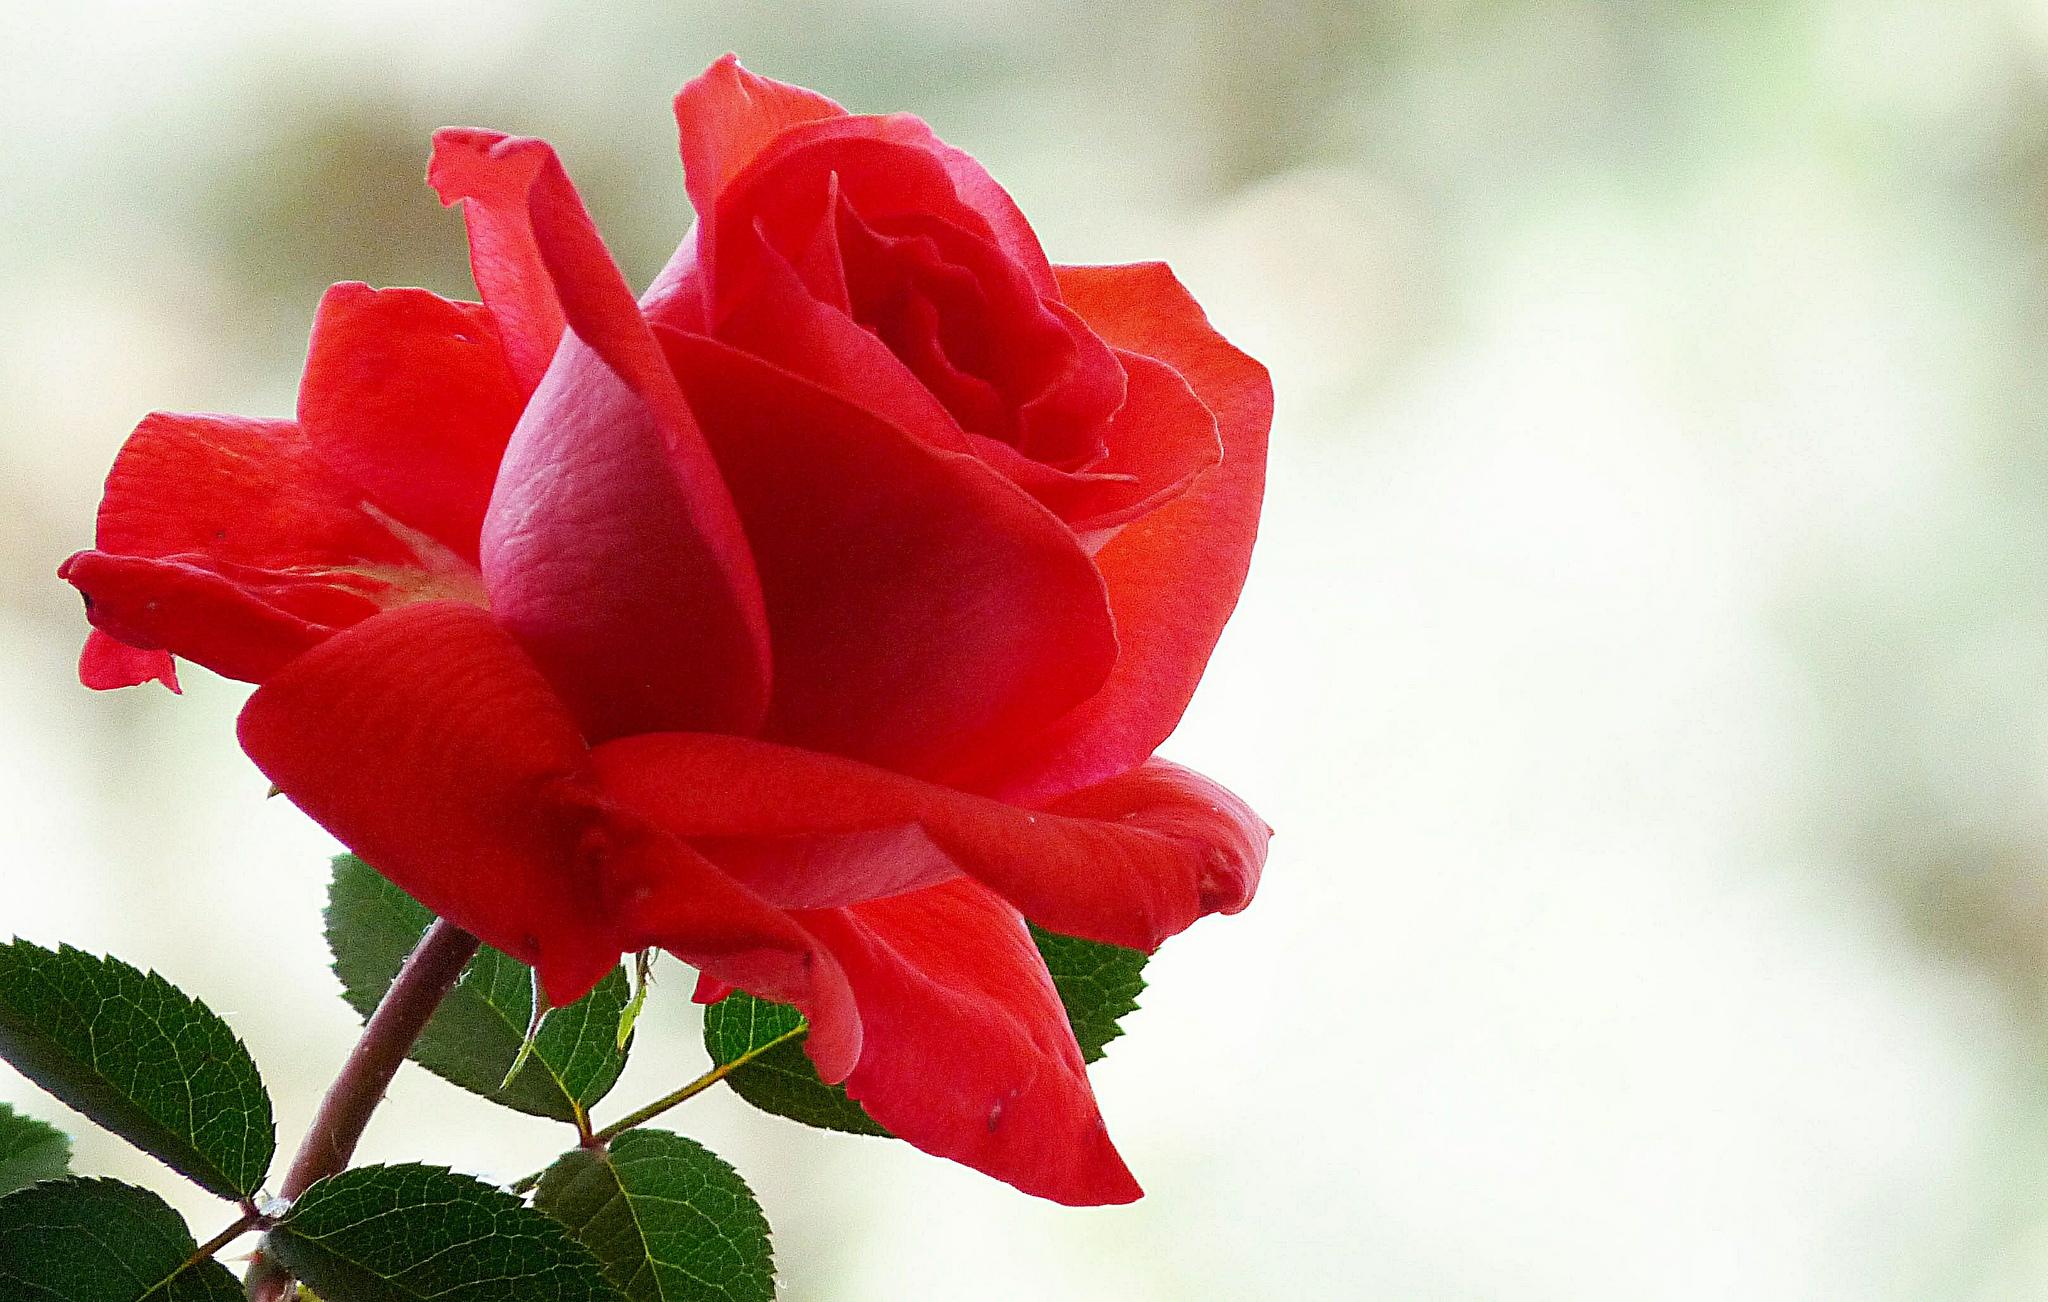 Rose full hd wallpaper and background image 2048x1302 - Big rose flower wallpaper ...